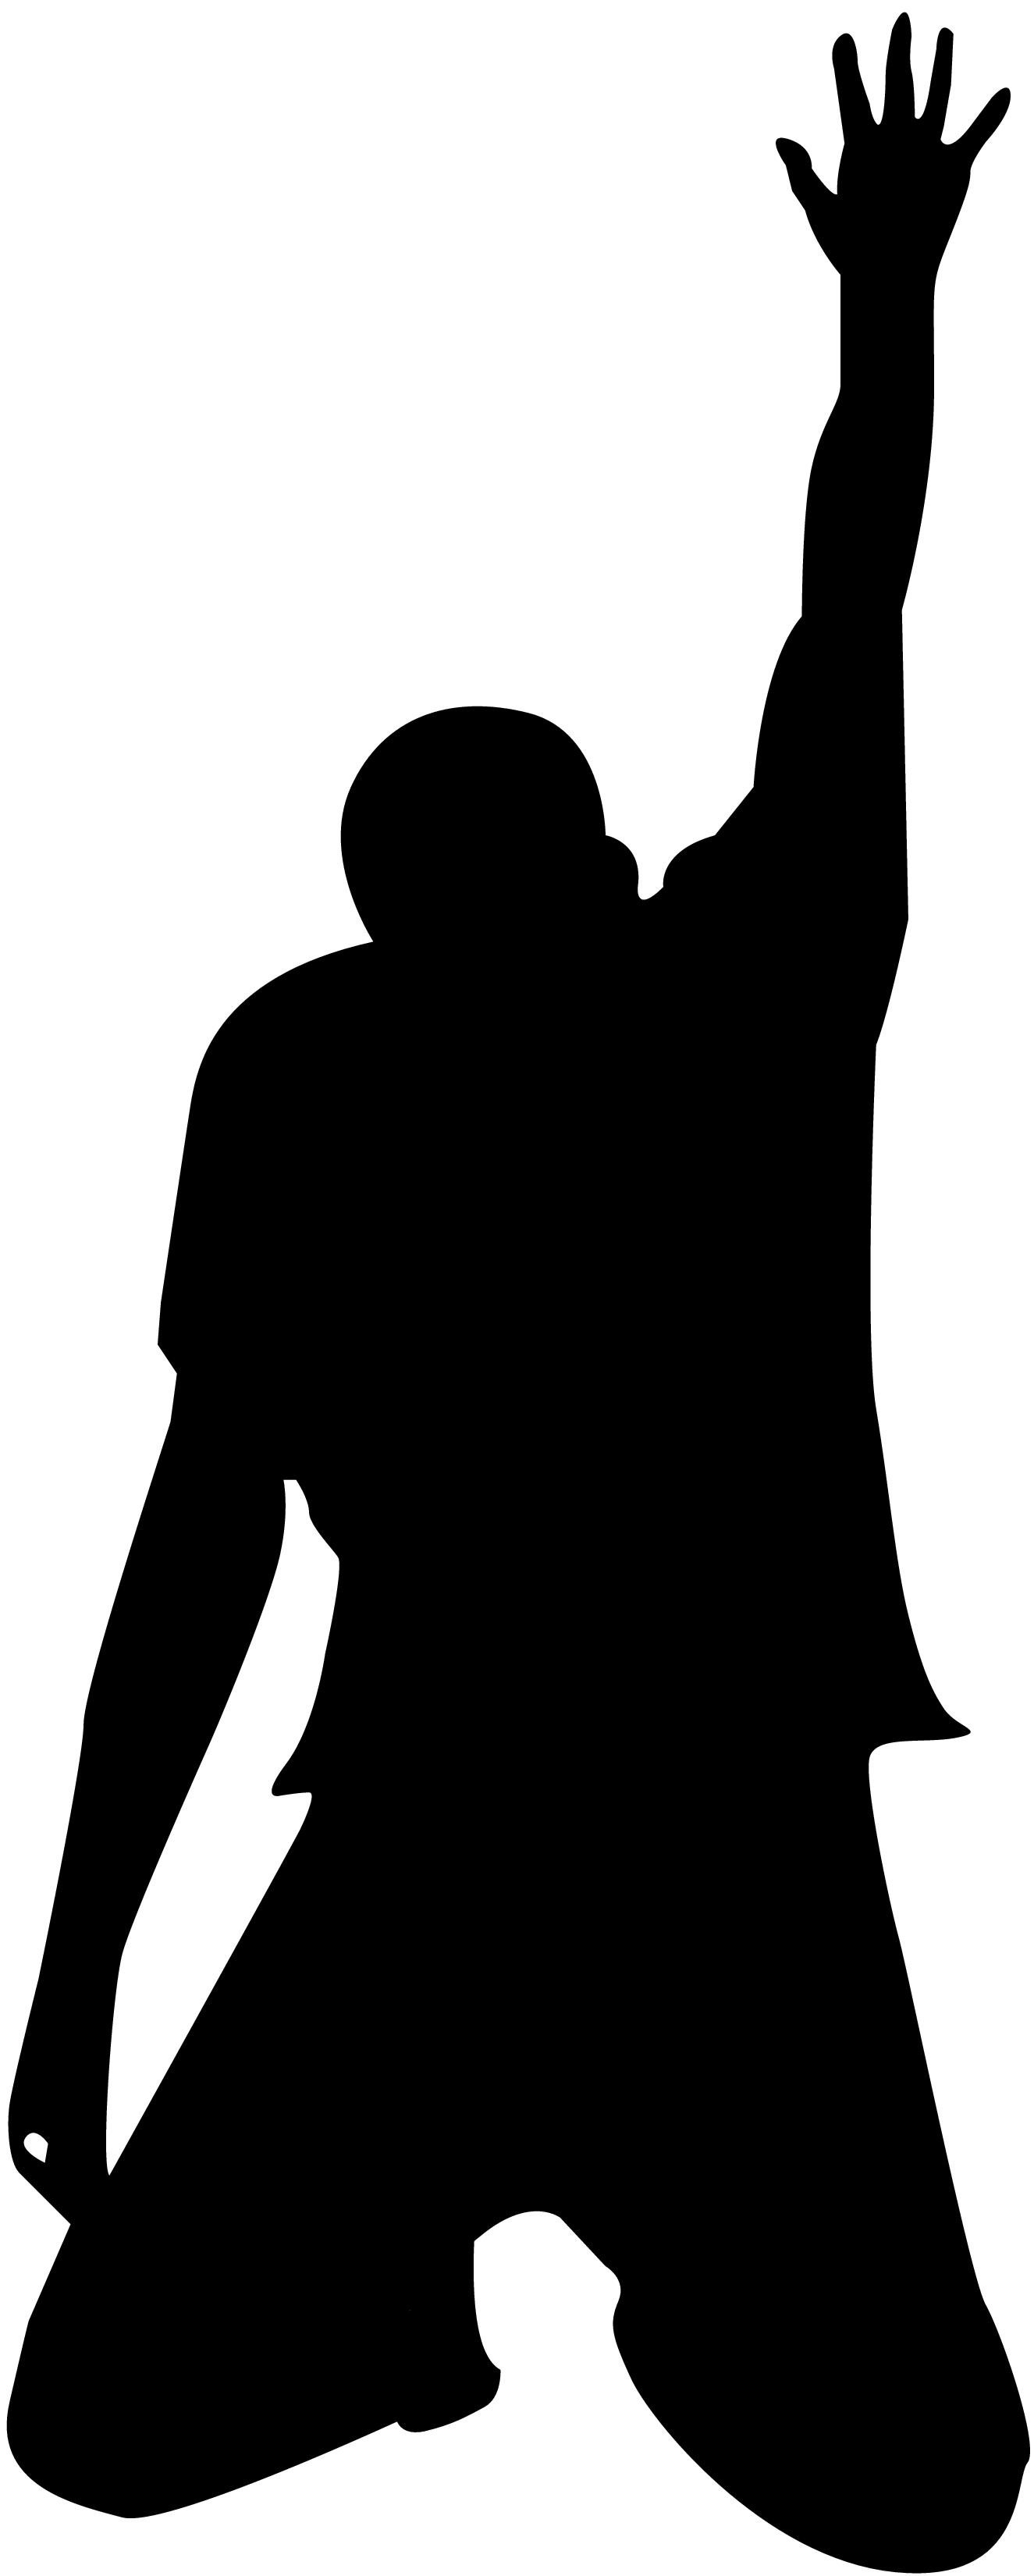 Man Praying Clipart Silhouette Ground.